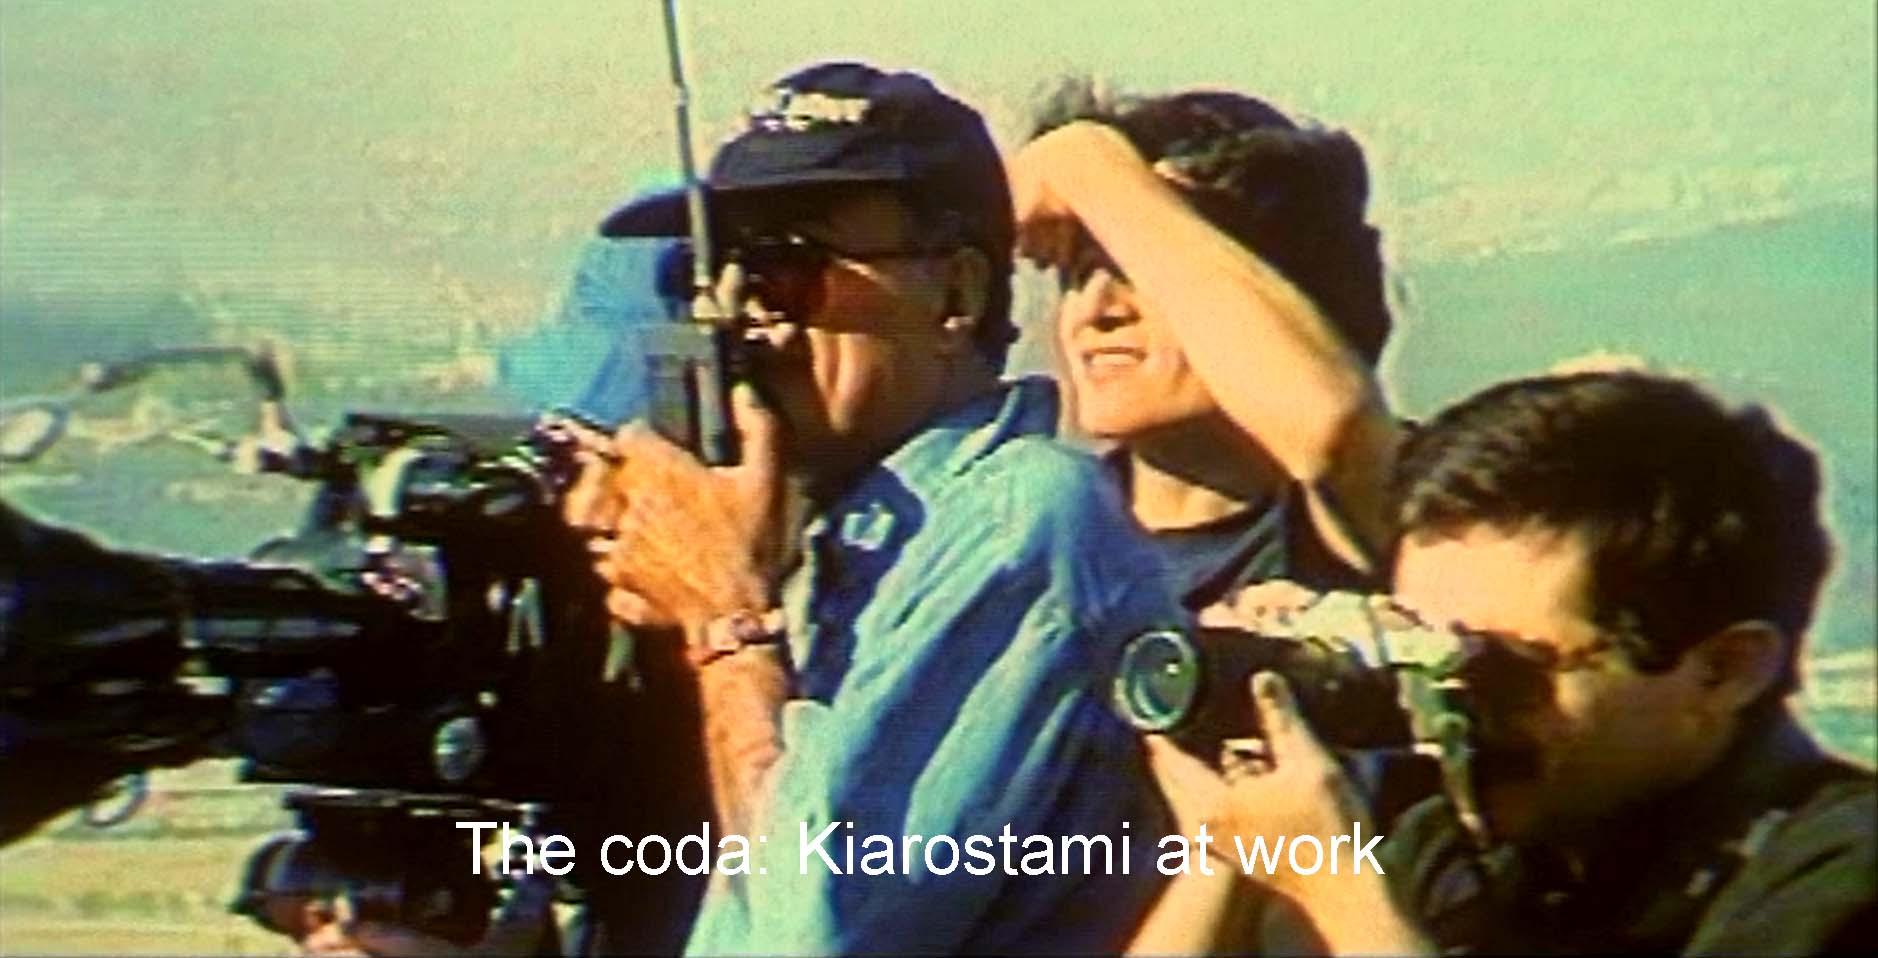 The Coda Kiarostami At Work